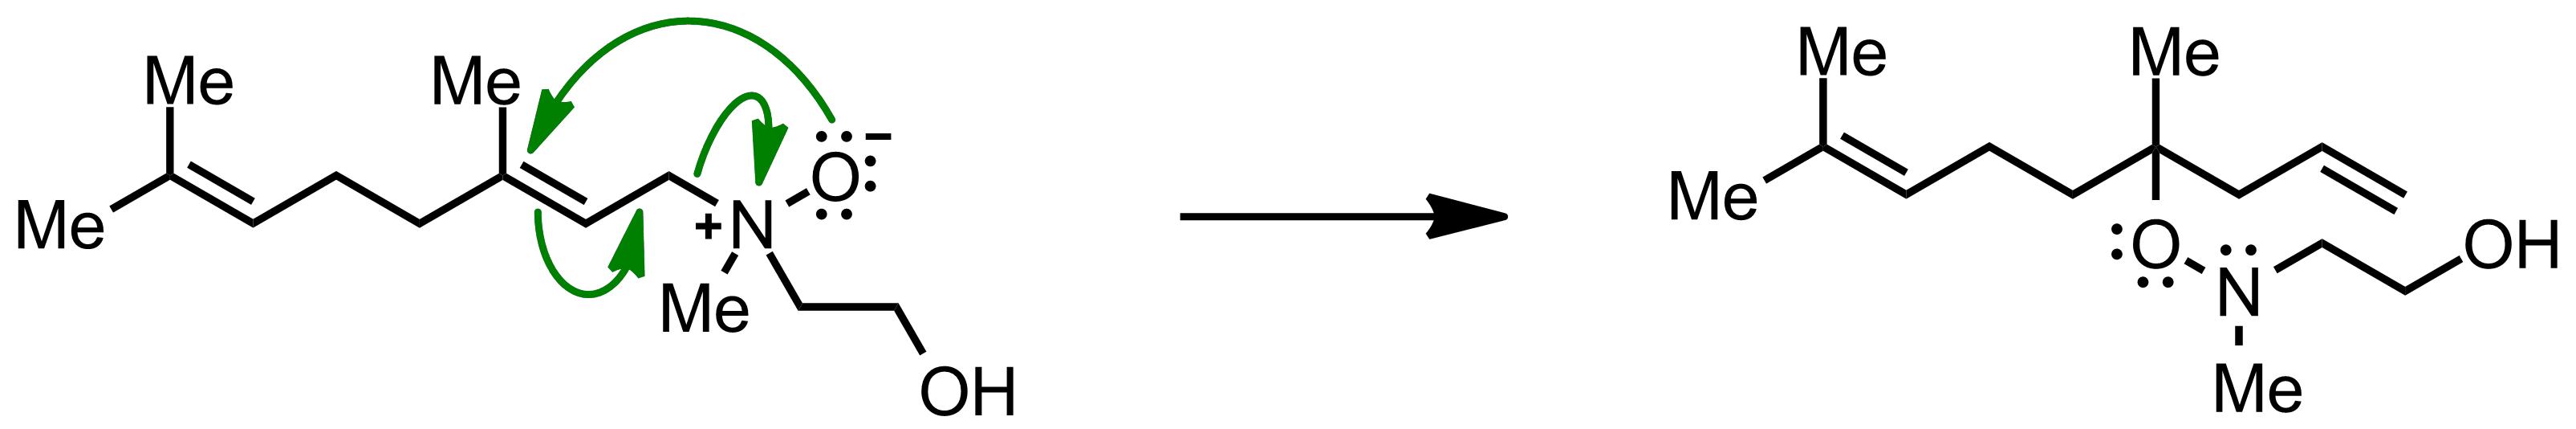 Mechanism of the Meisenheimer Rearrangement